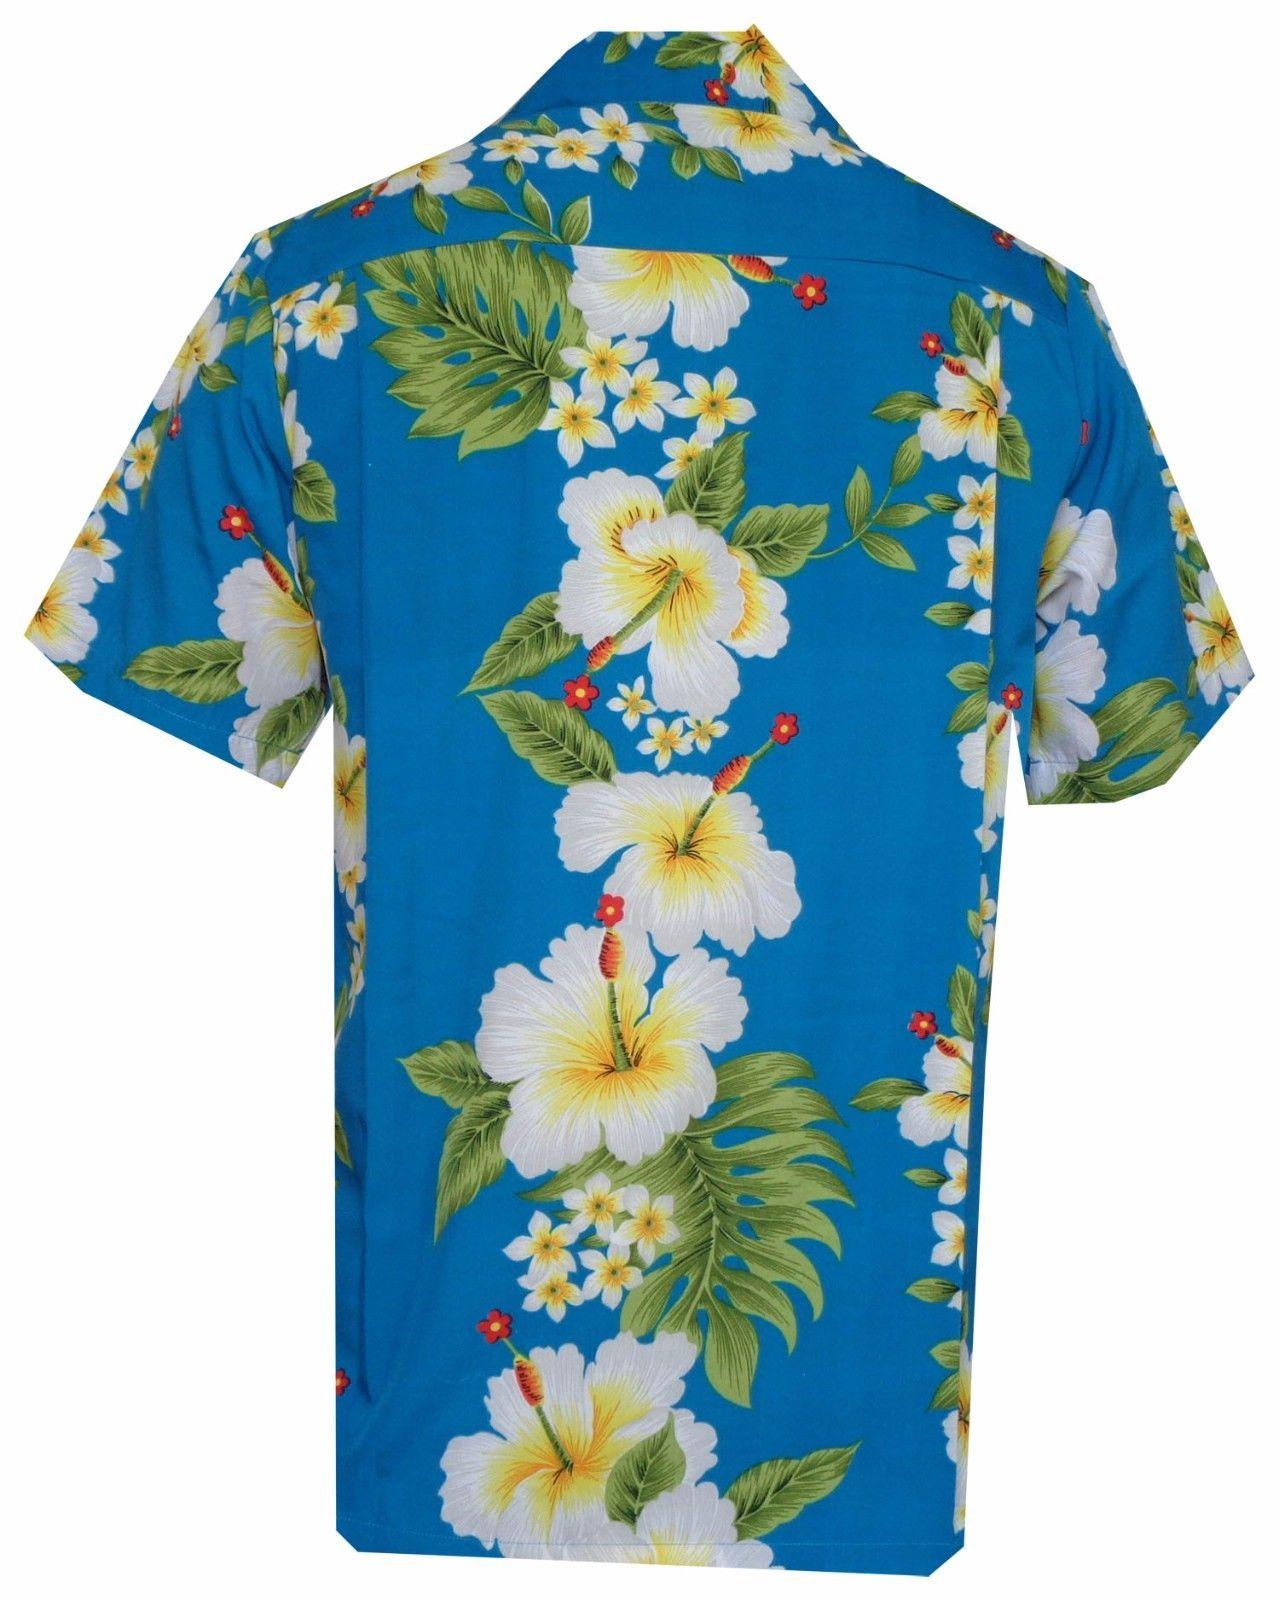 Hawaiian-Shirts-Mens-Hibiscus-Flower-Print-Beach-Party-Aloha thumbnail 4